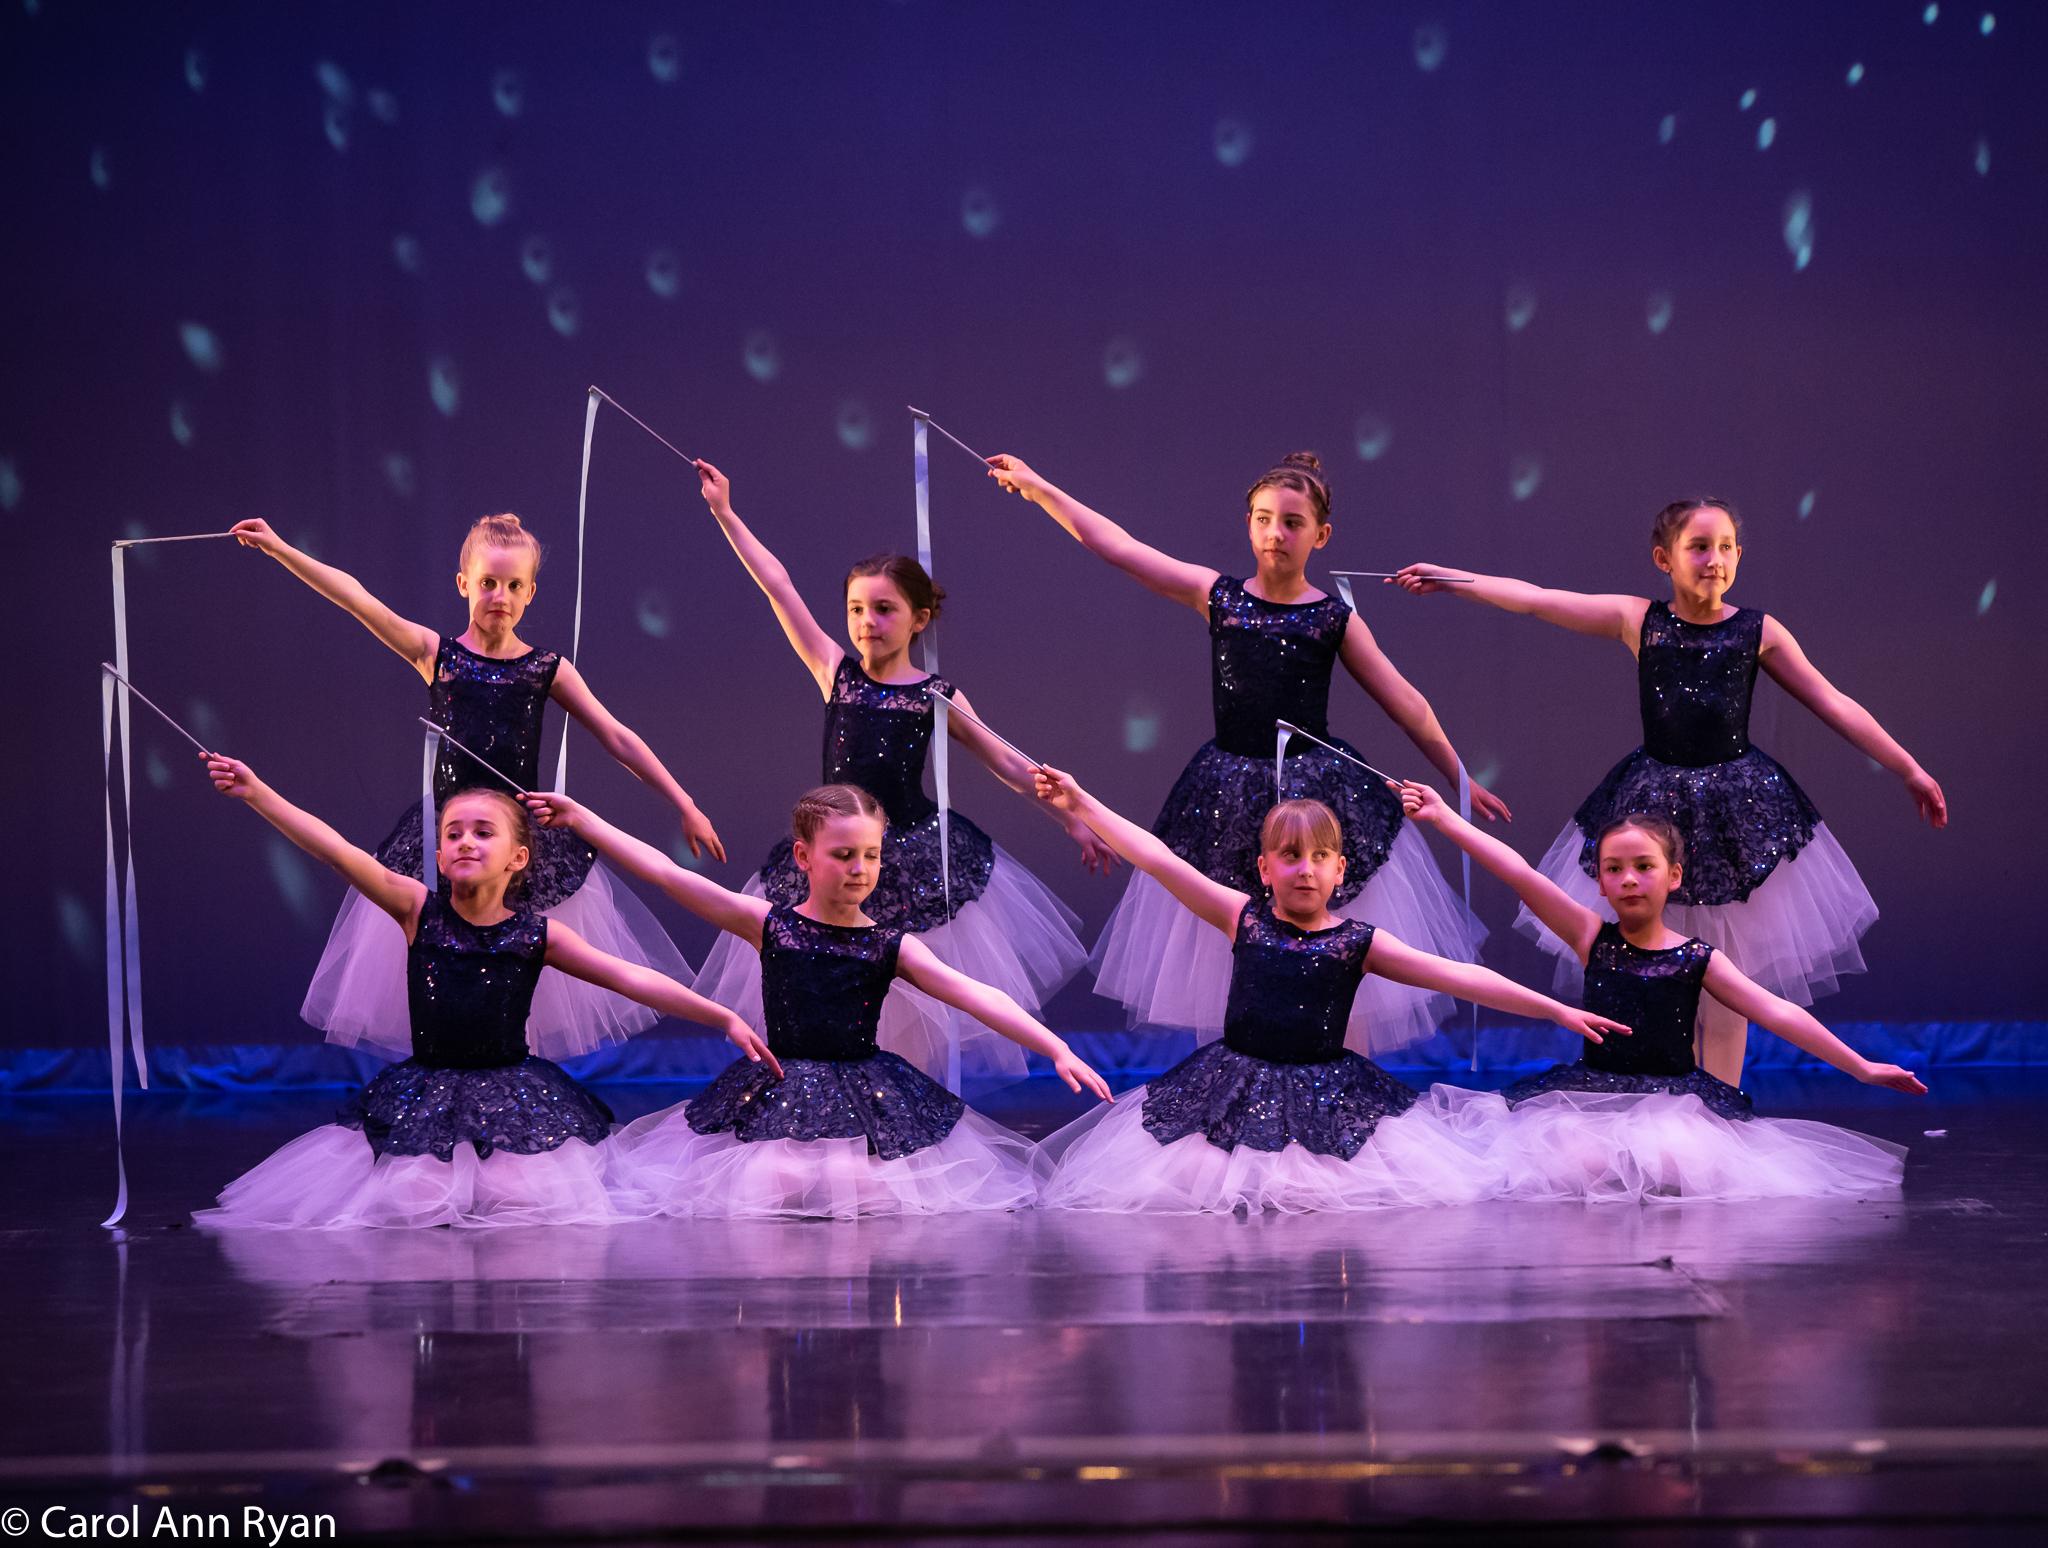 2019_06_05-Dance Recital 36645-1.jpg